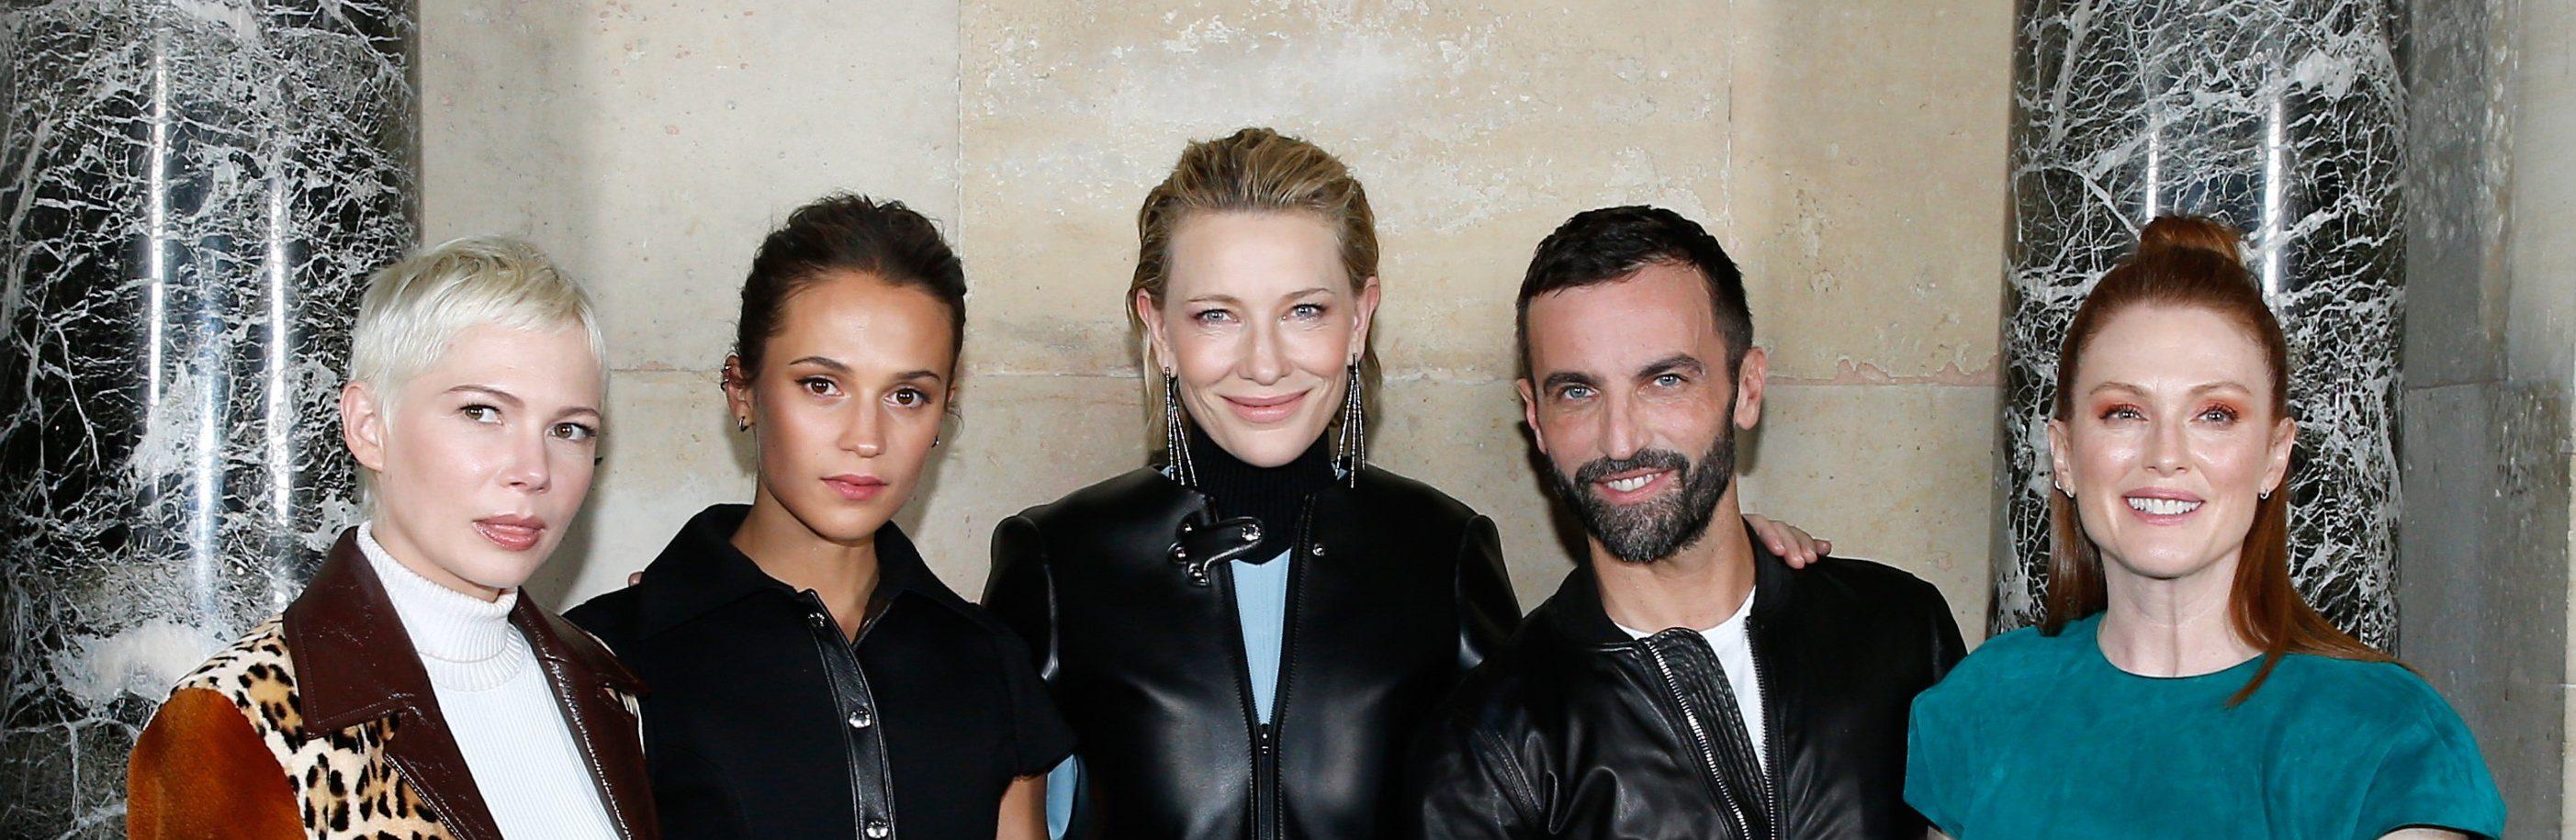 Cate Blanchett at Louis Vuitton Fashion Show Spring Summer 2018 #PFW